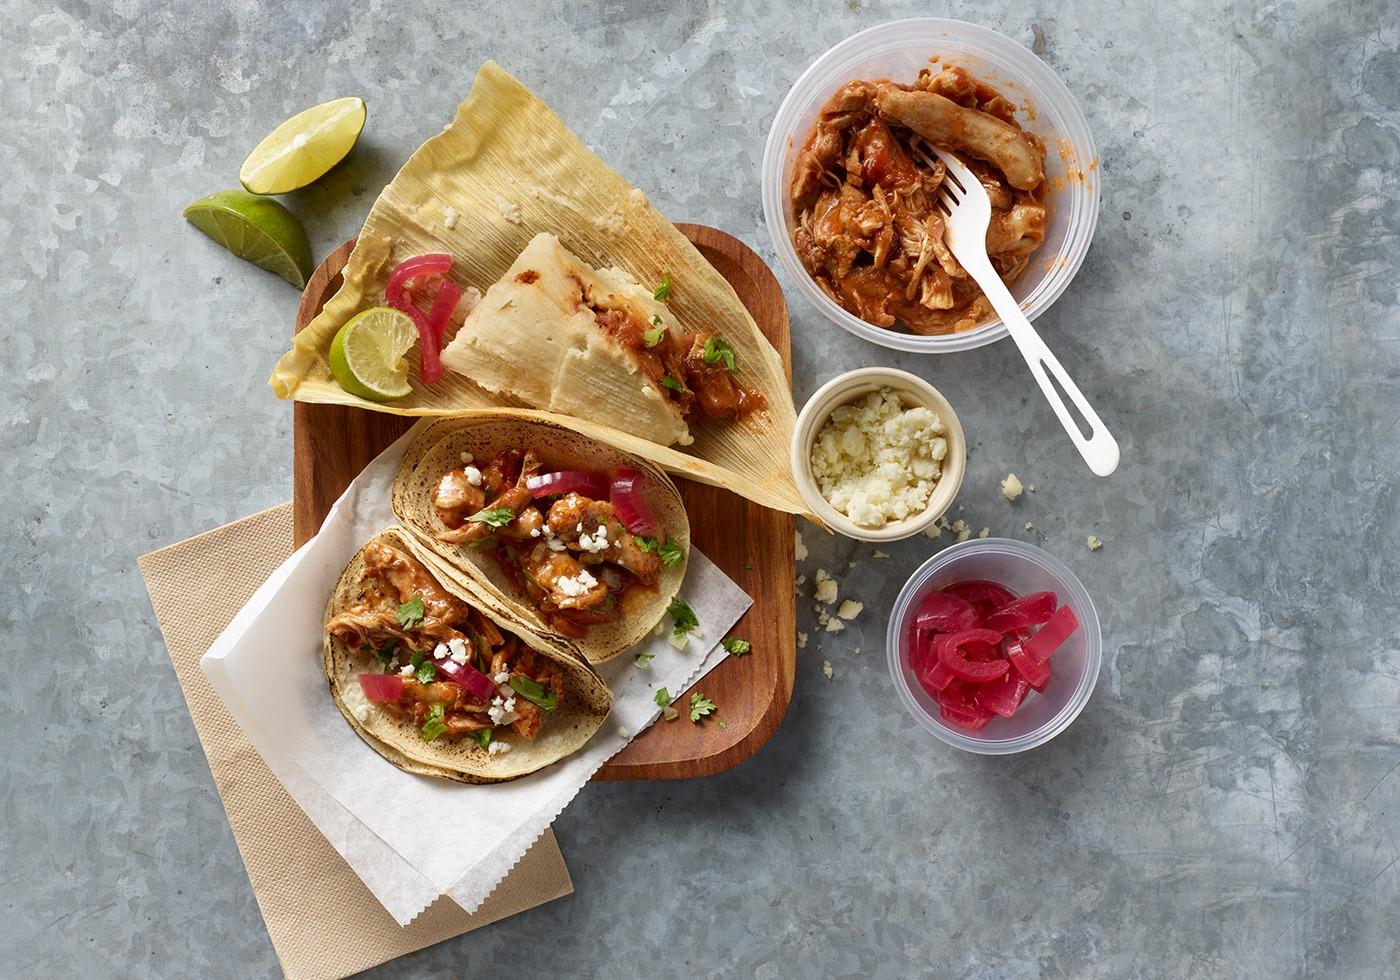 Smoked-Chicken-Picante-Tacos-Tamales